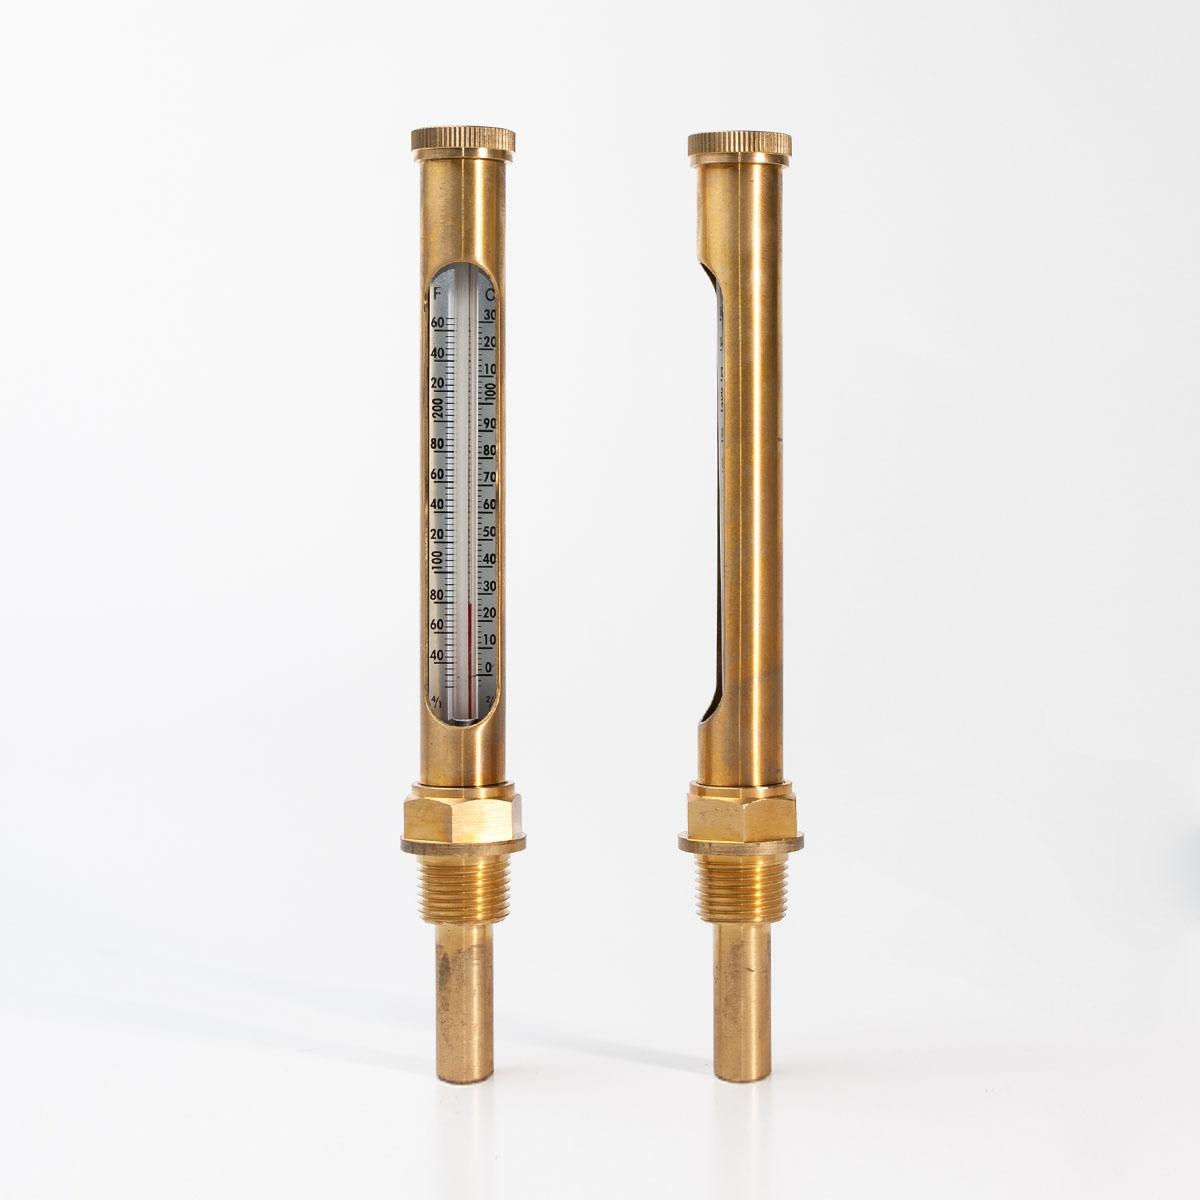 SRT 003 - Stakleni ravni termometar